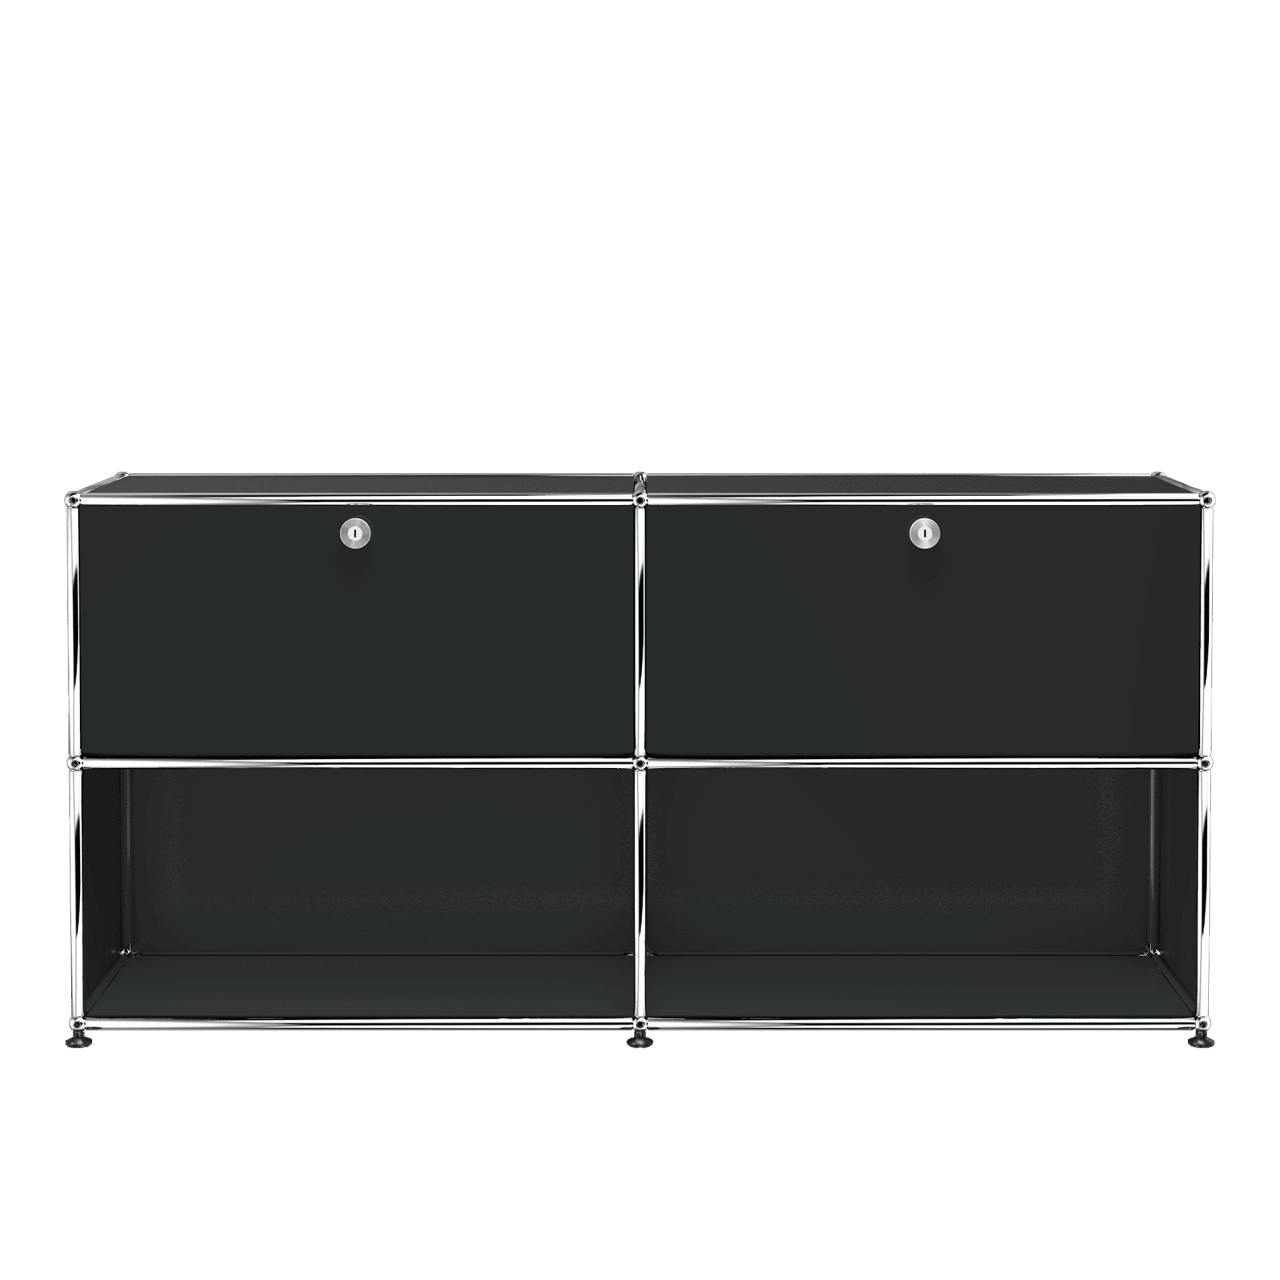 Haller Sideboard 2x2 mit Klappen oben